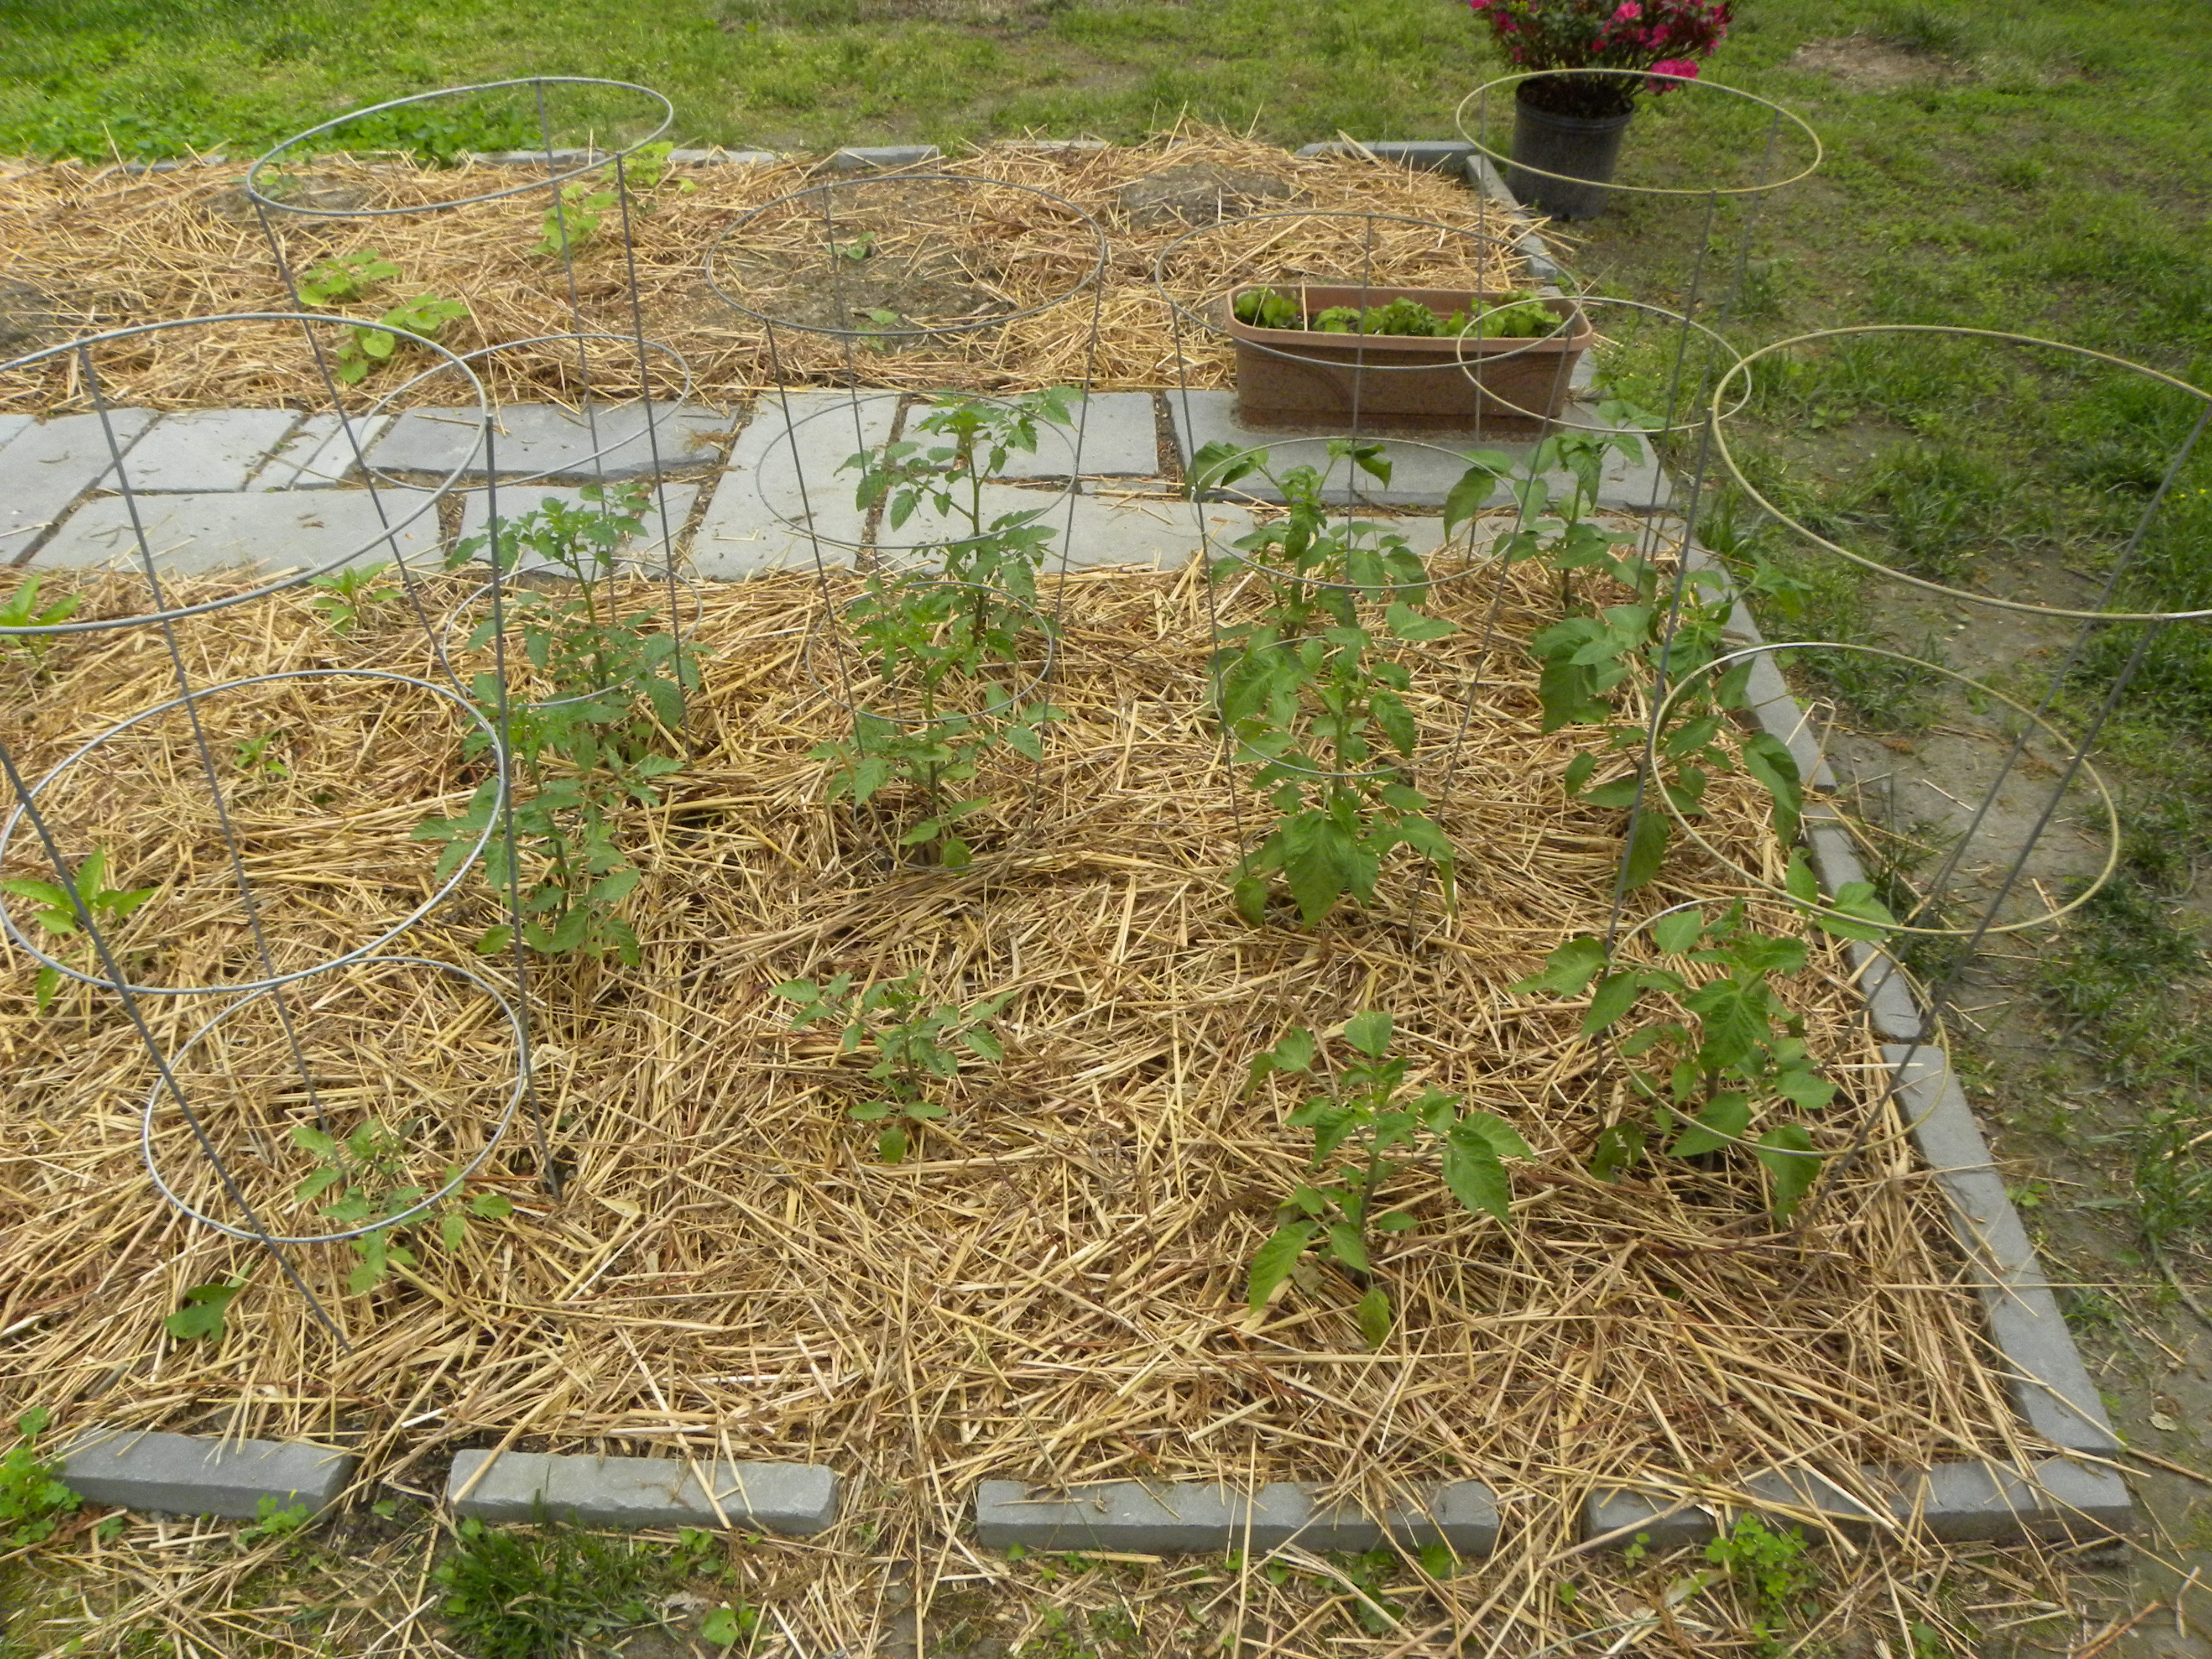 Garden Update Homemade Organic Pesticide A Two Storey Home